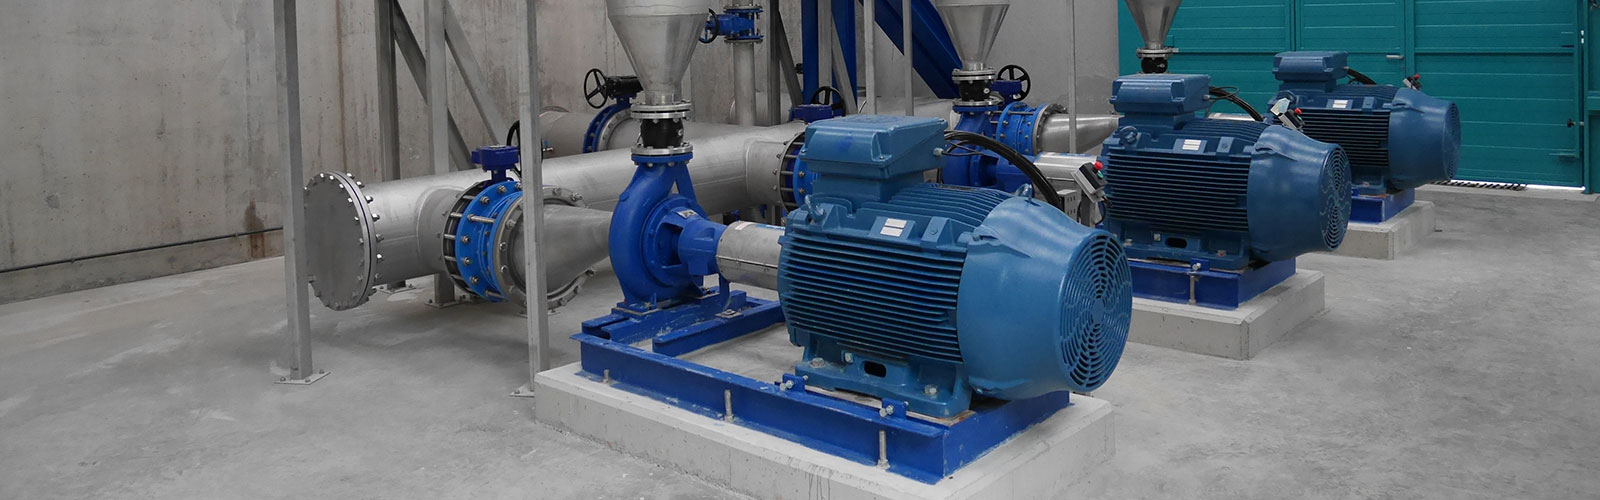 aquaserve water solutions